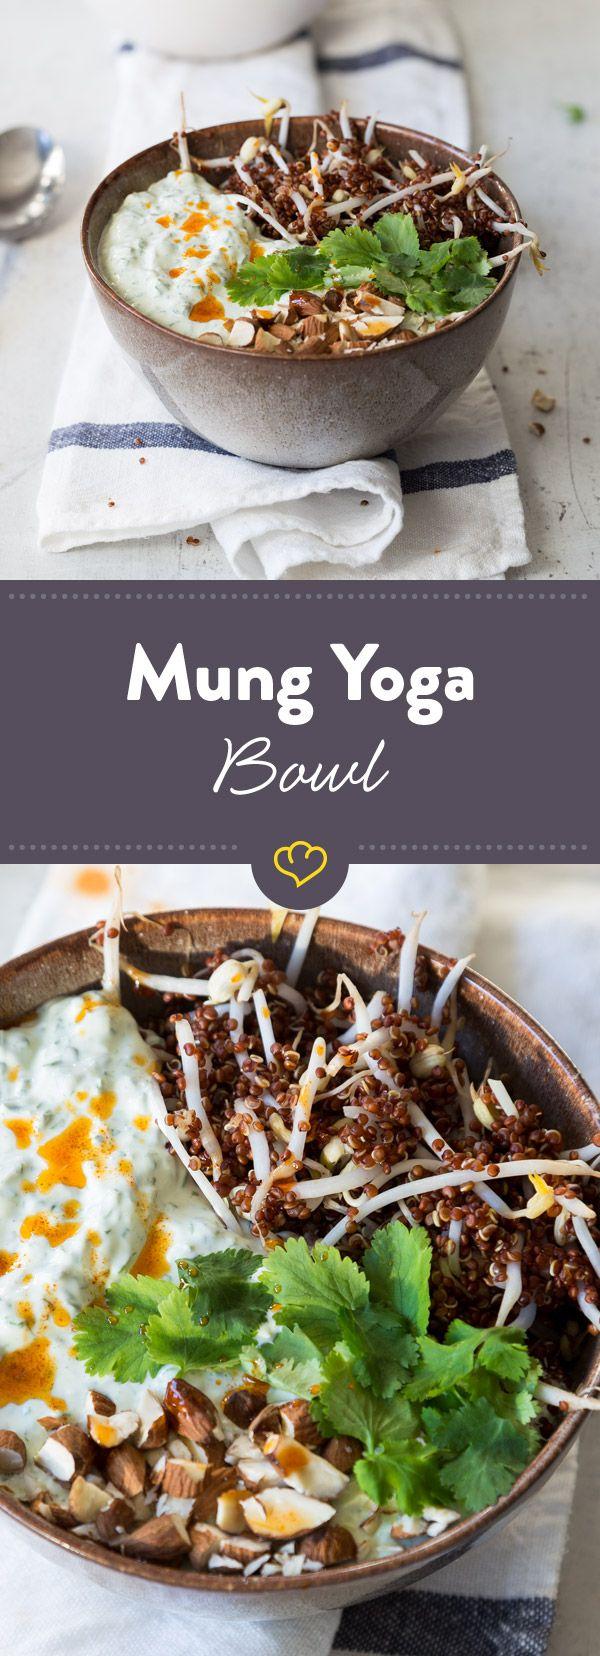 Greek Yogurt plus Mungbohnen macht: Mung Yoga Bowl